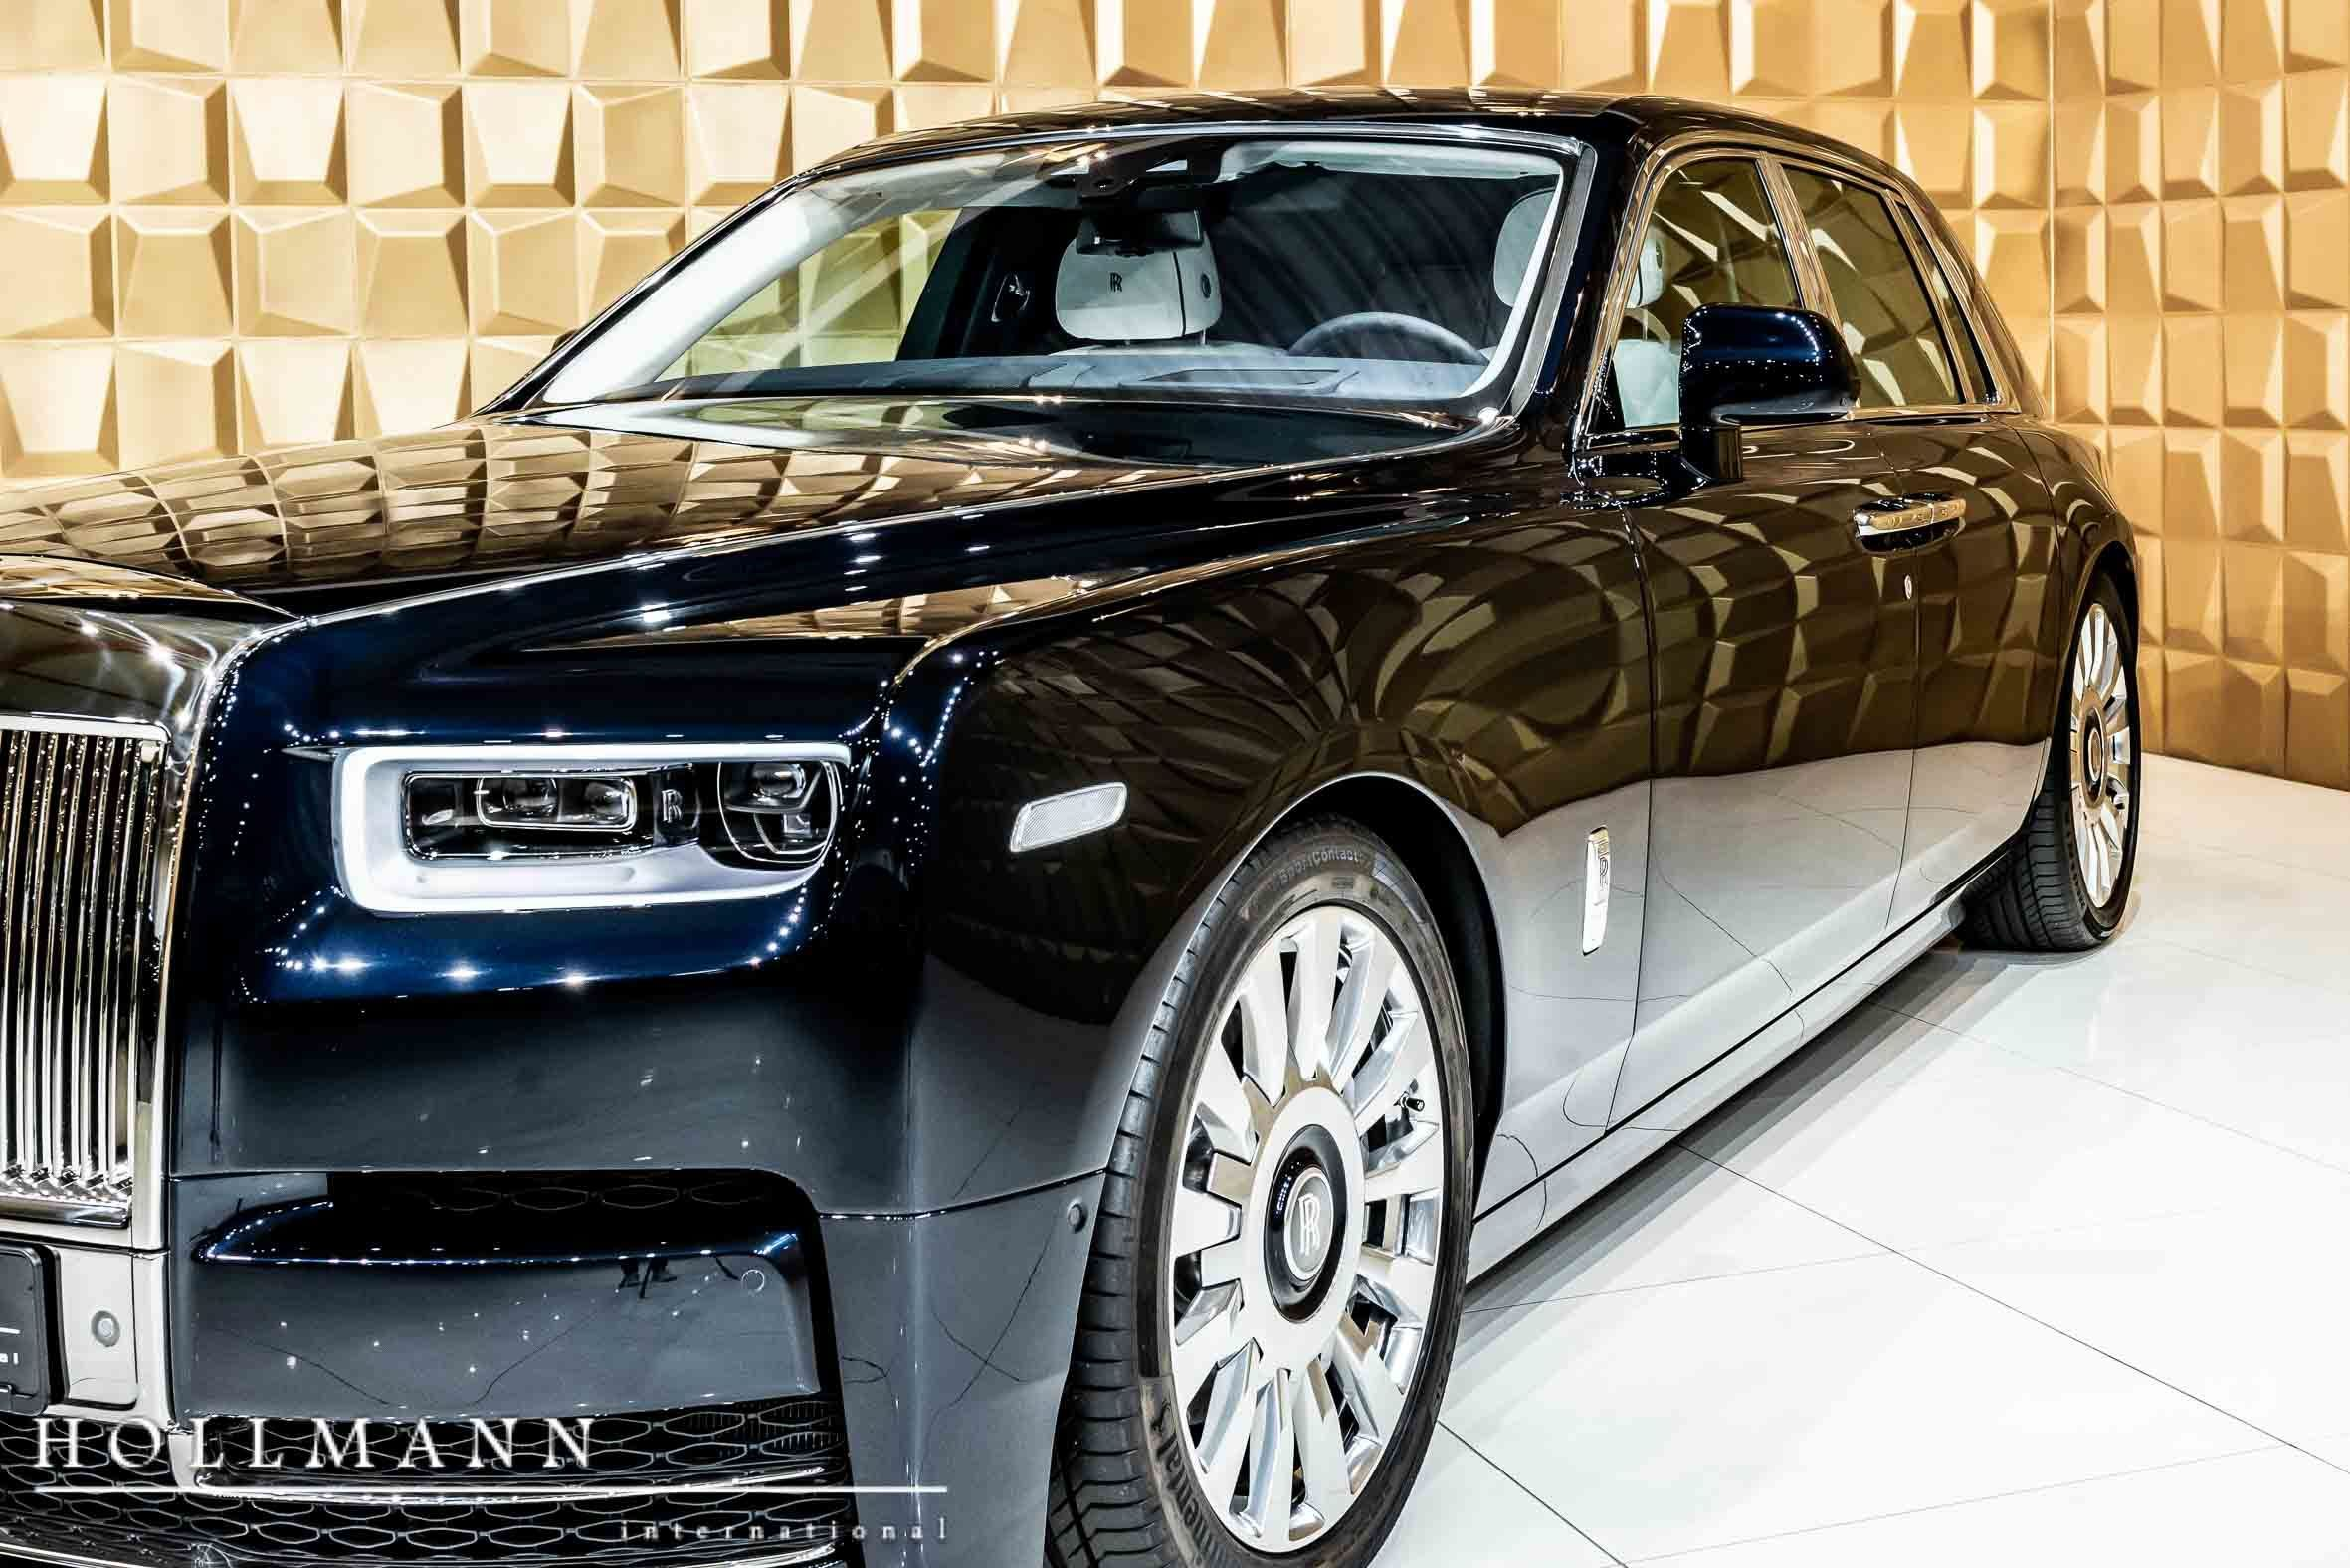 Rolls Royce Phantom Viii Luxury Pulse Cars Germany For Sale On Luxurypulse Rolls Royce Rolls Royce Phantom Limousine Interior